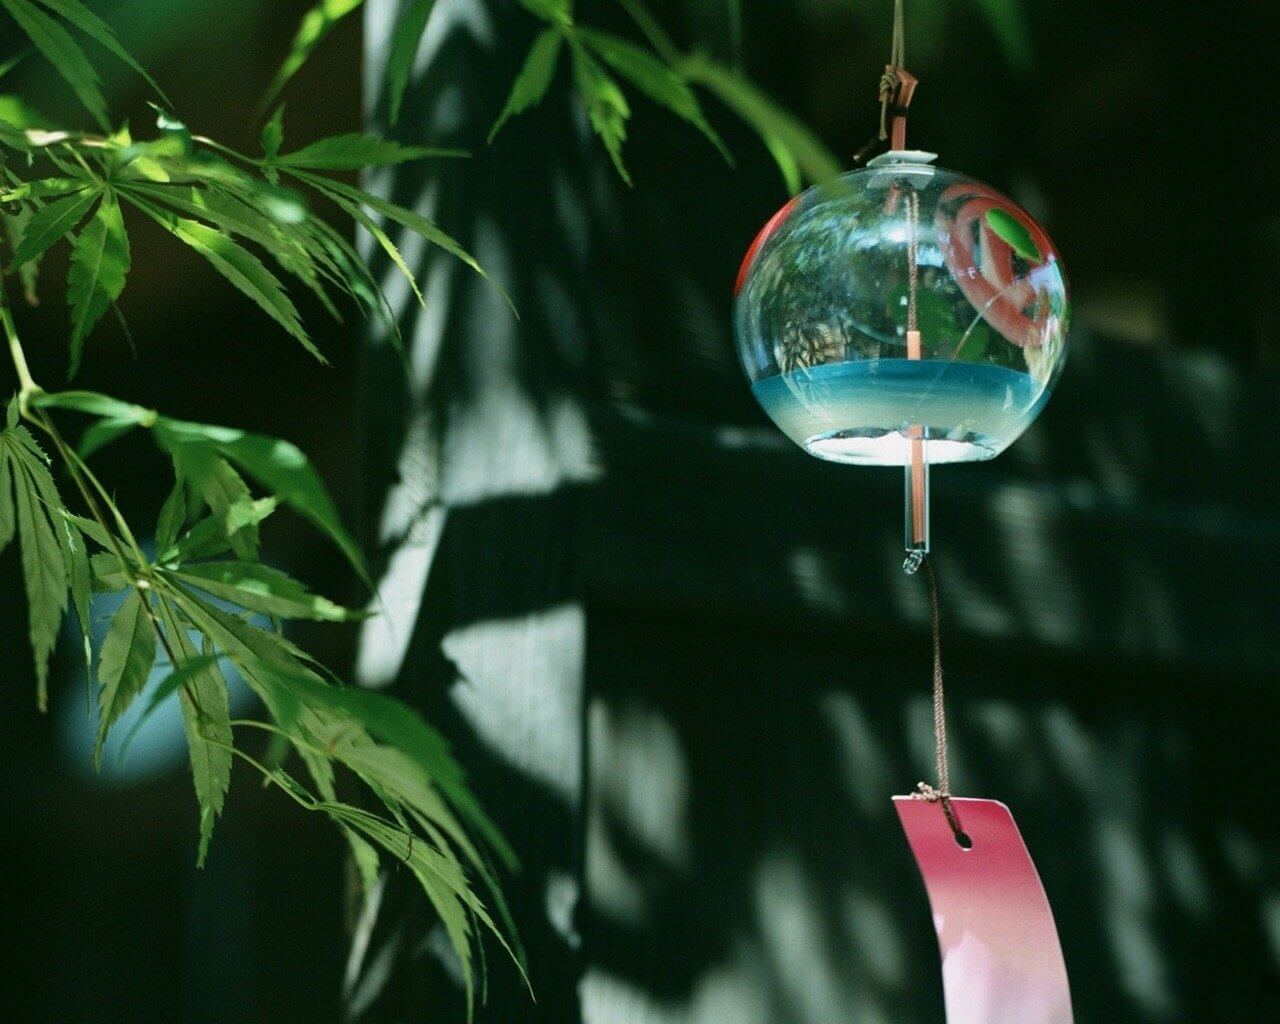 Japanese wind chimes things to buy in Japan